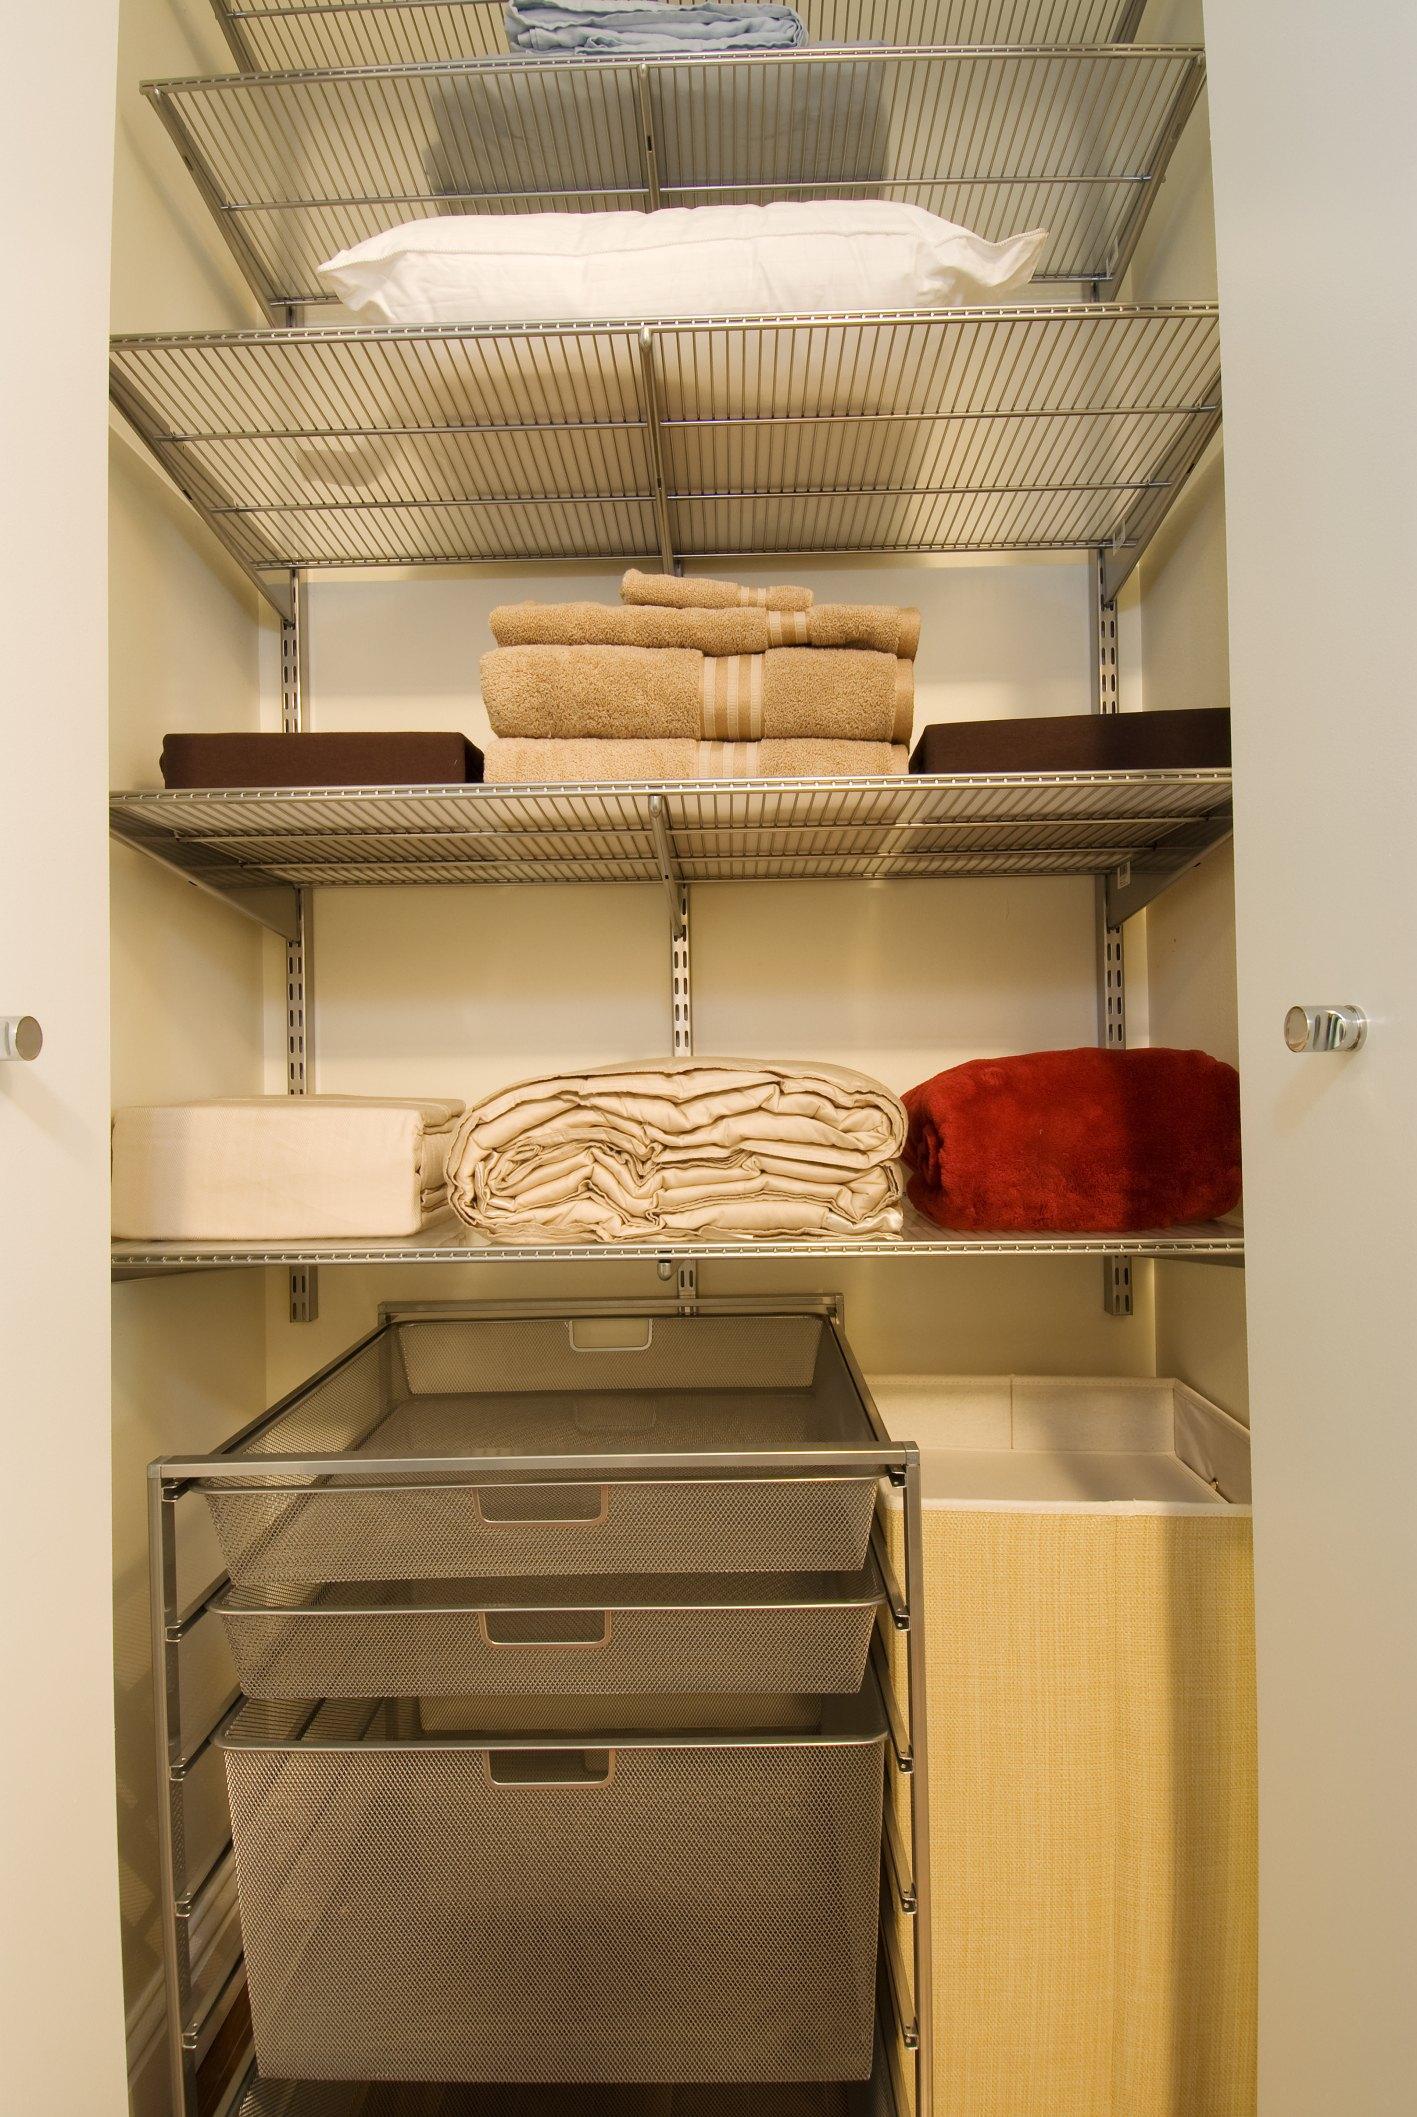 how to build closet shelves ehow. Black Bedroom Furniture Sets. Home Design Ideas